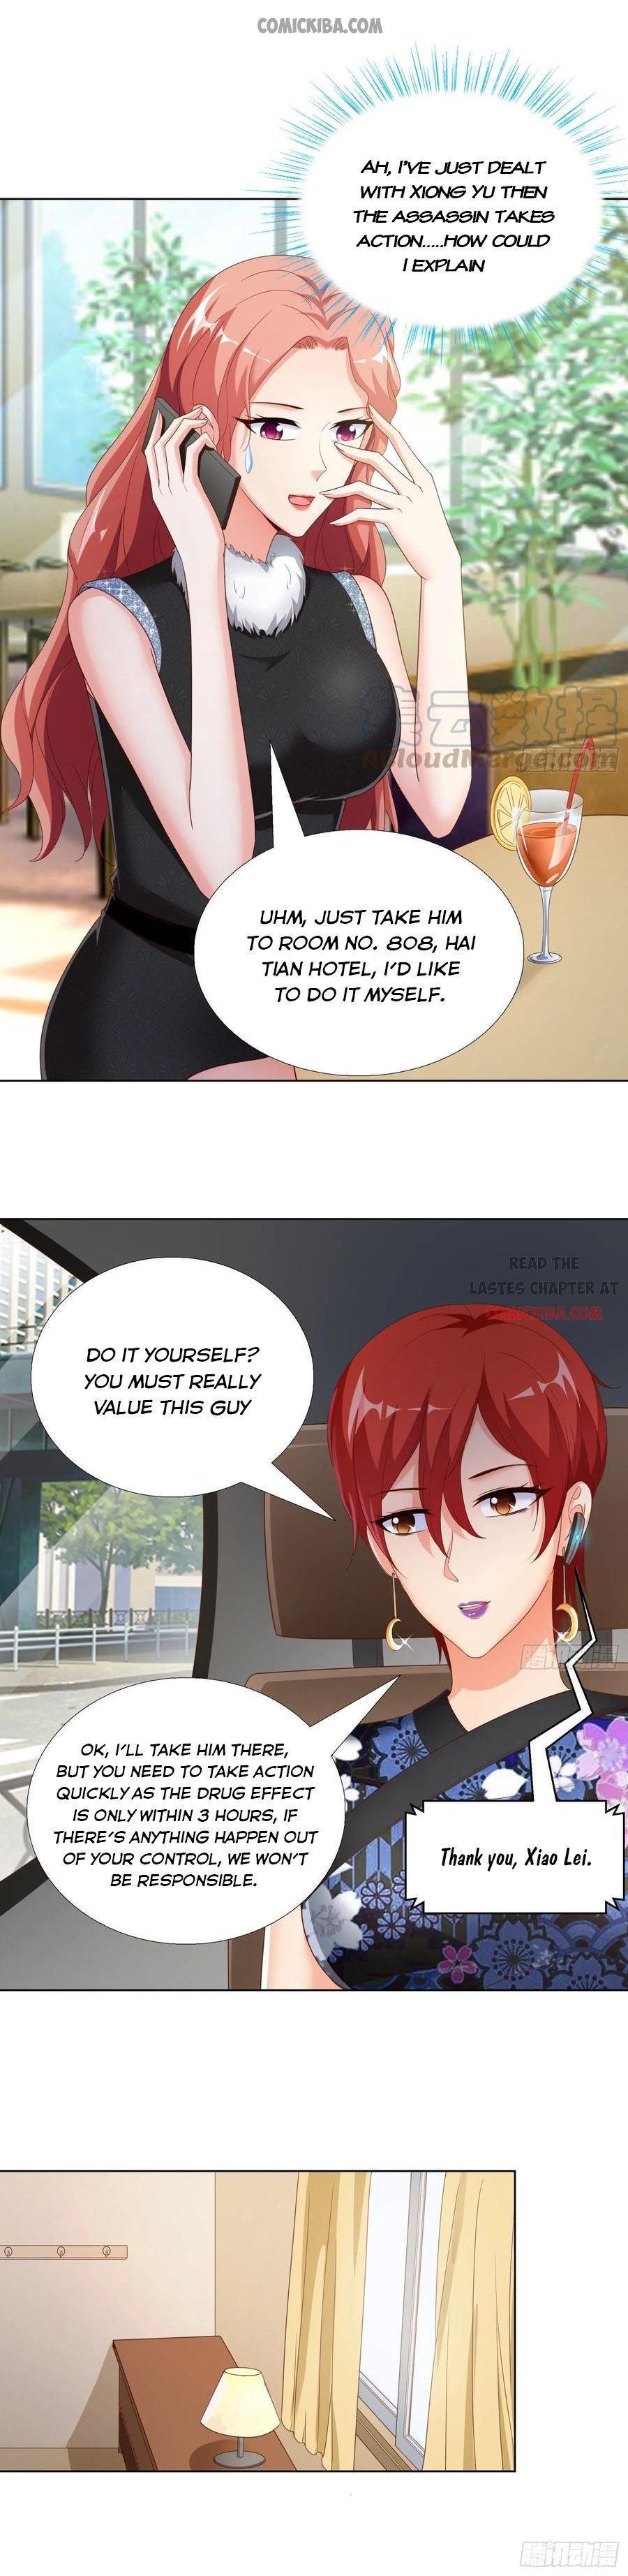 Super School Doctor Chapter 64 page 4 - Mangakakalots.com